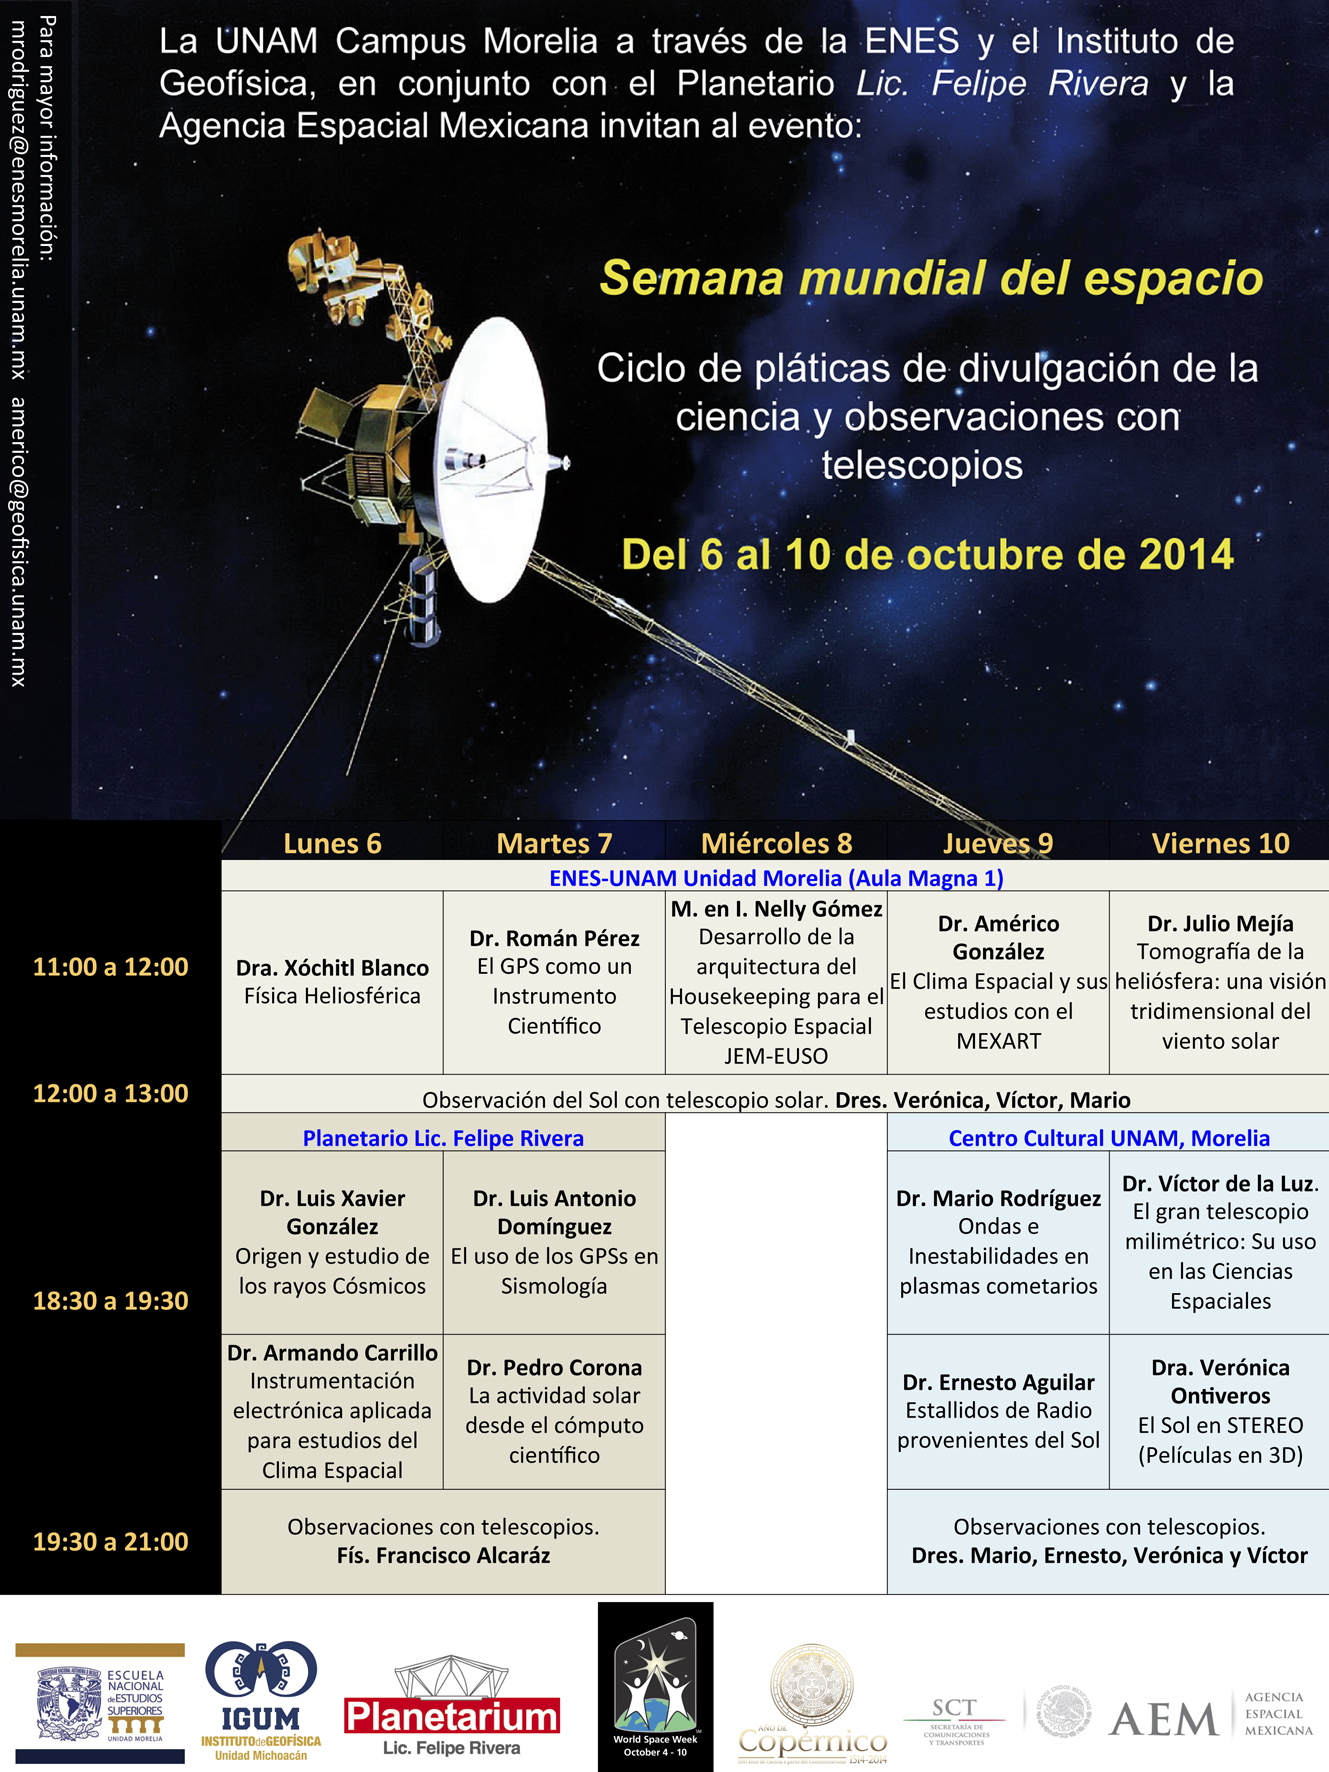 semana_mundial_espacio